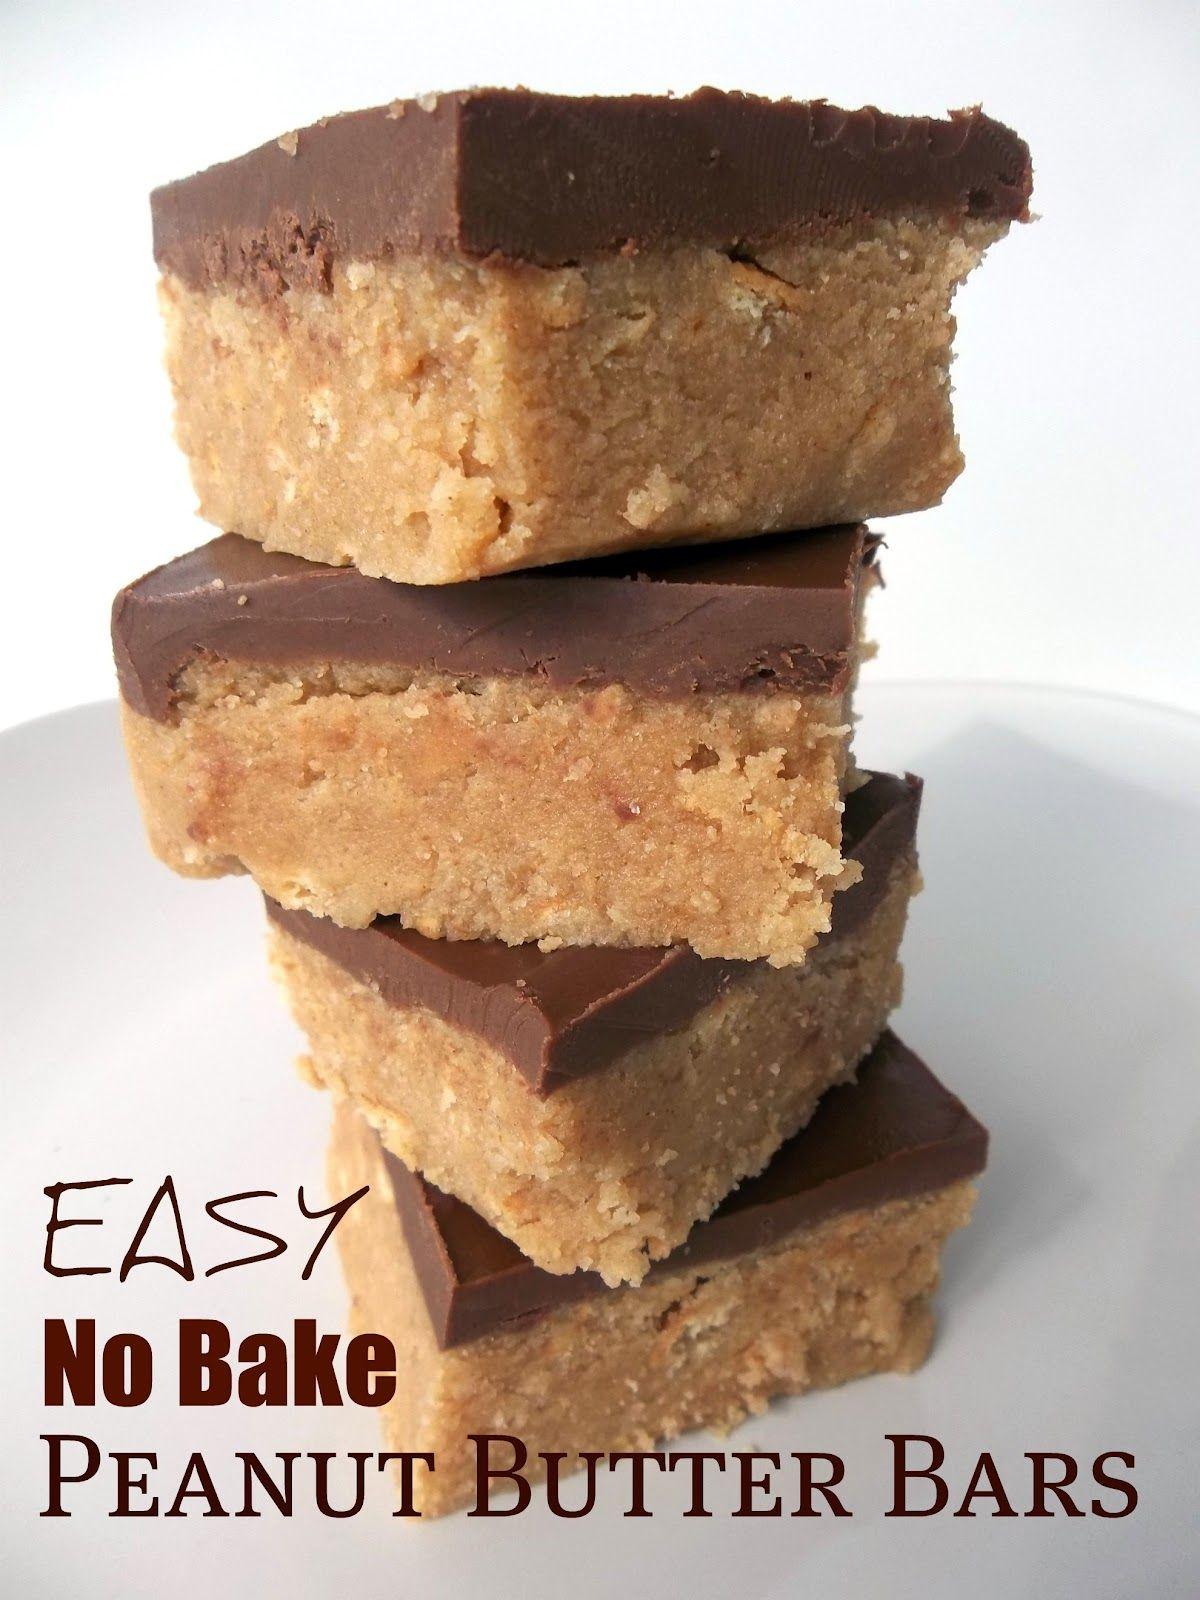 Six Sisters' Stuff: Easy No Bake Peanut Butter Bars Recipe